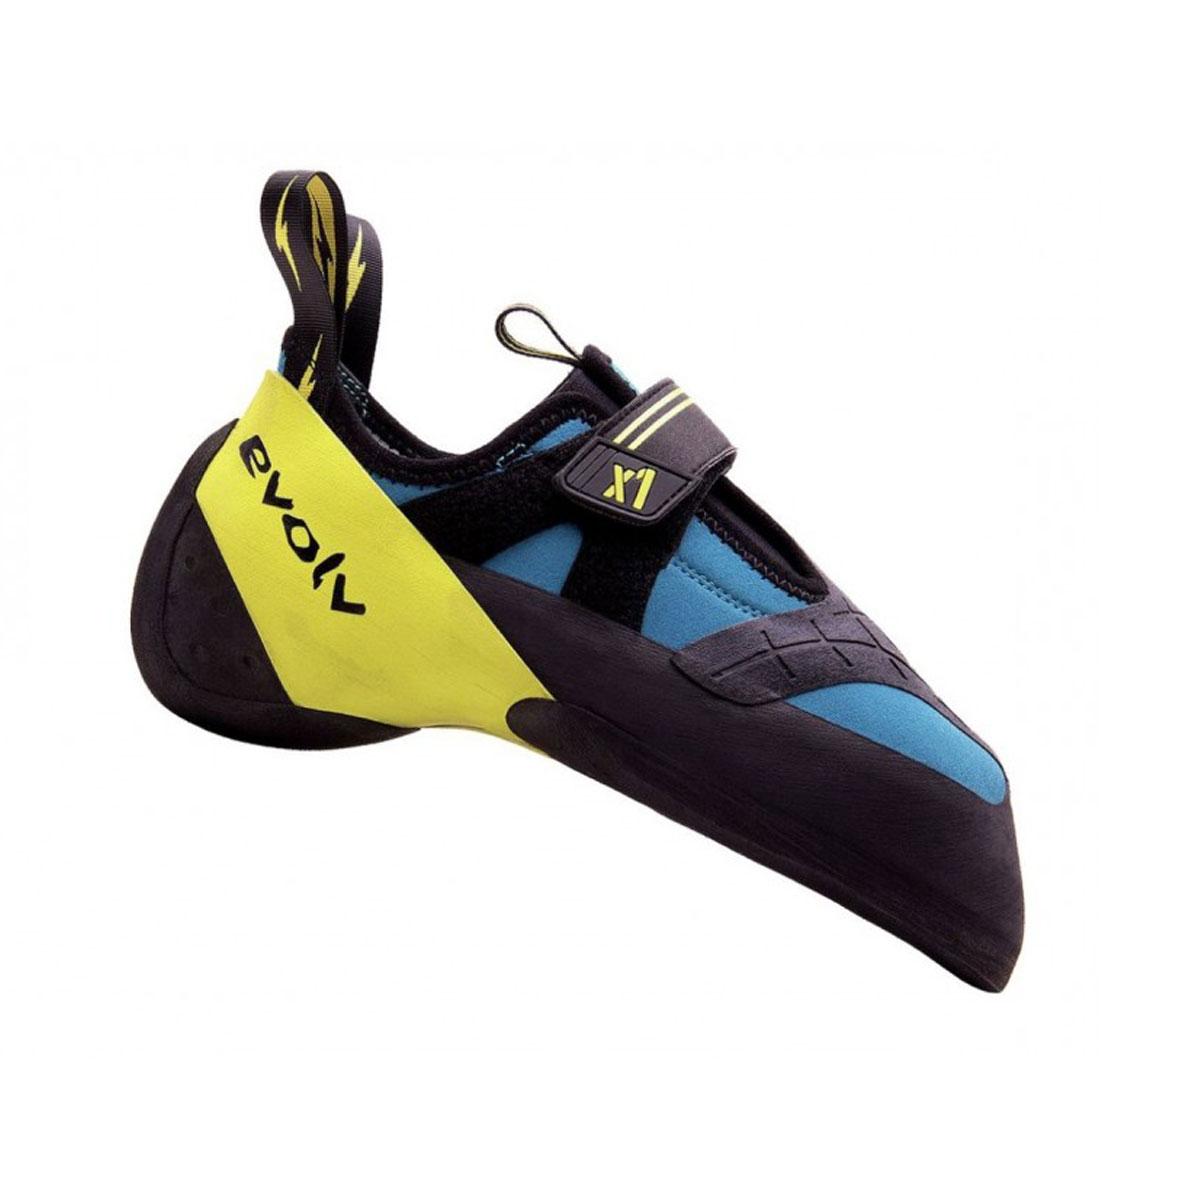 Evolv X1 Climbing Shoes | Kletterschuhe